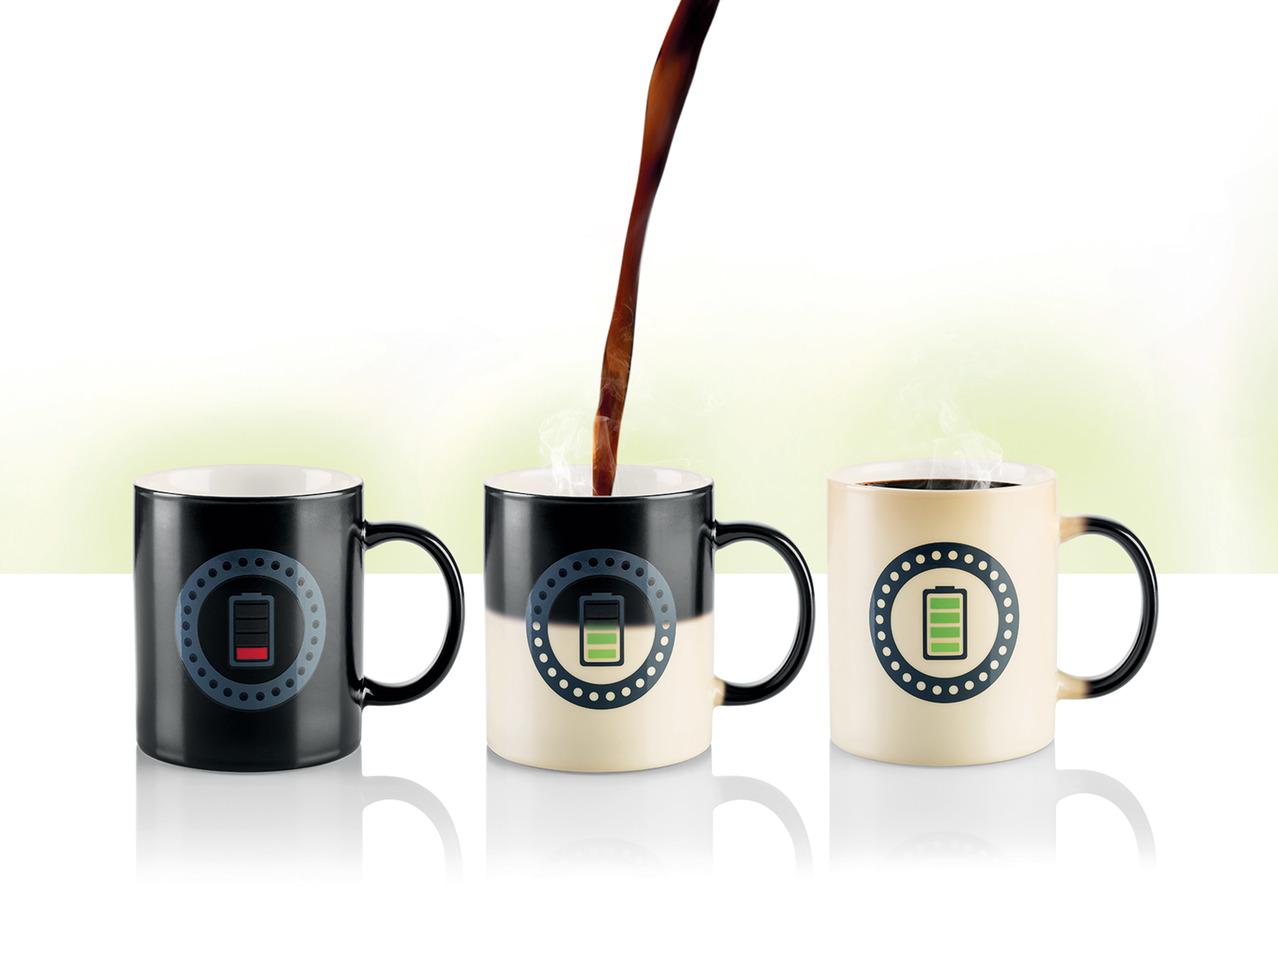 Custom Coffee Mugs - Create Personalized Coffee Mugs ...